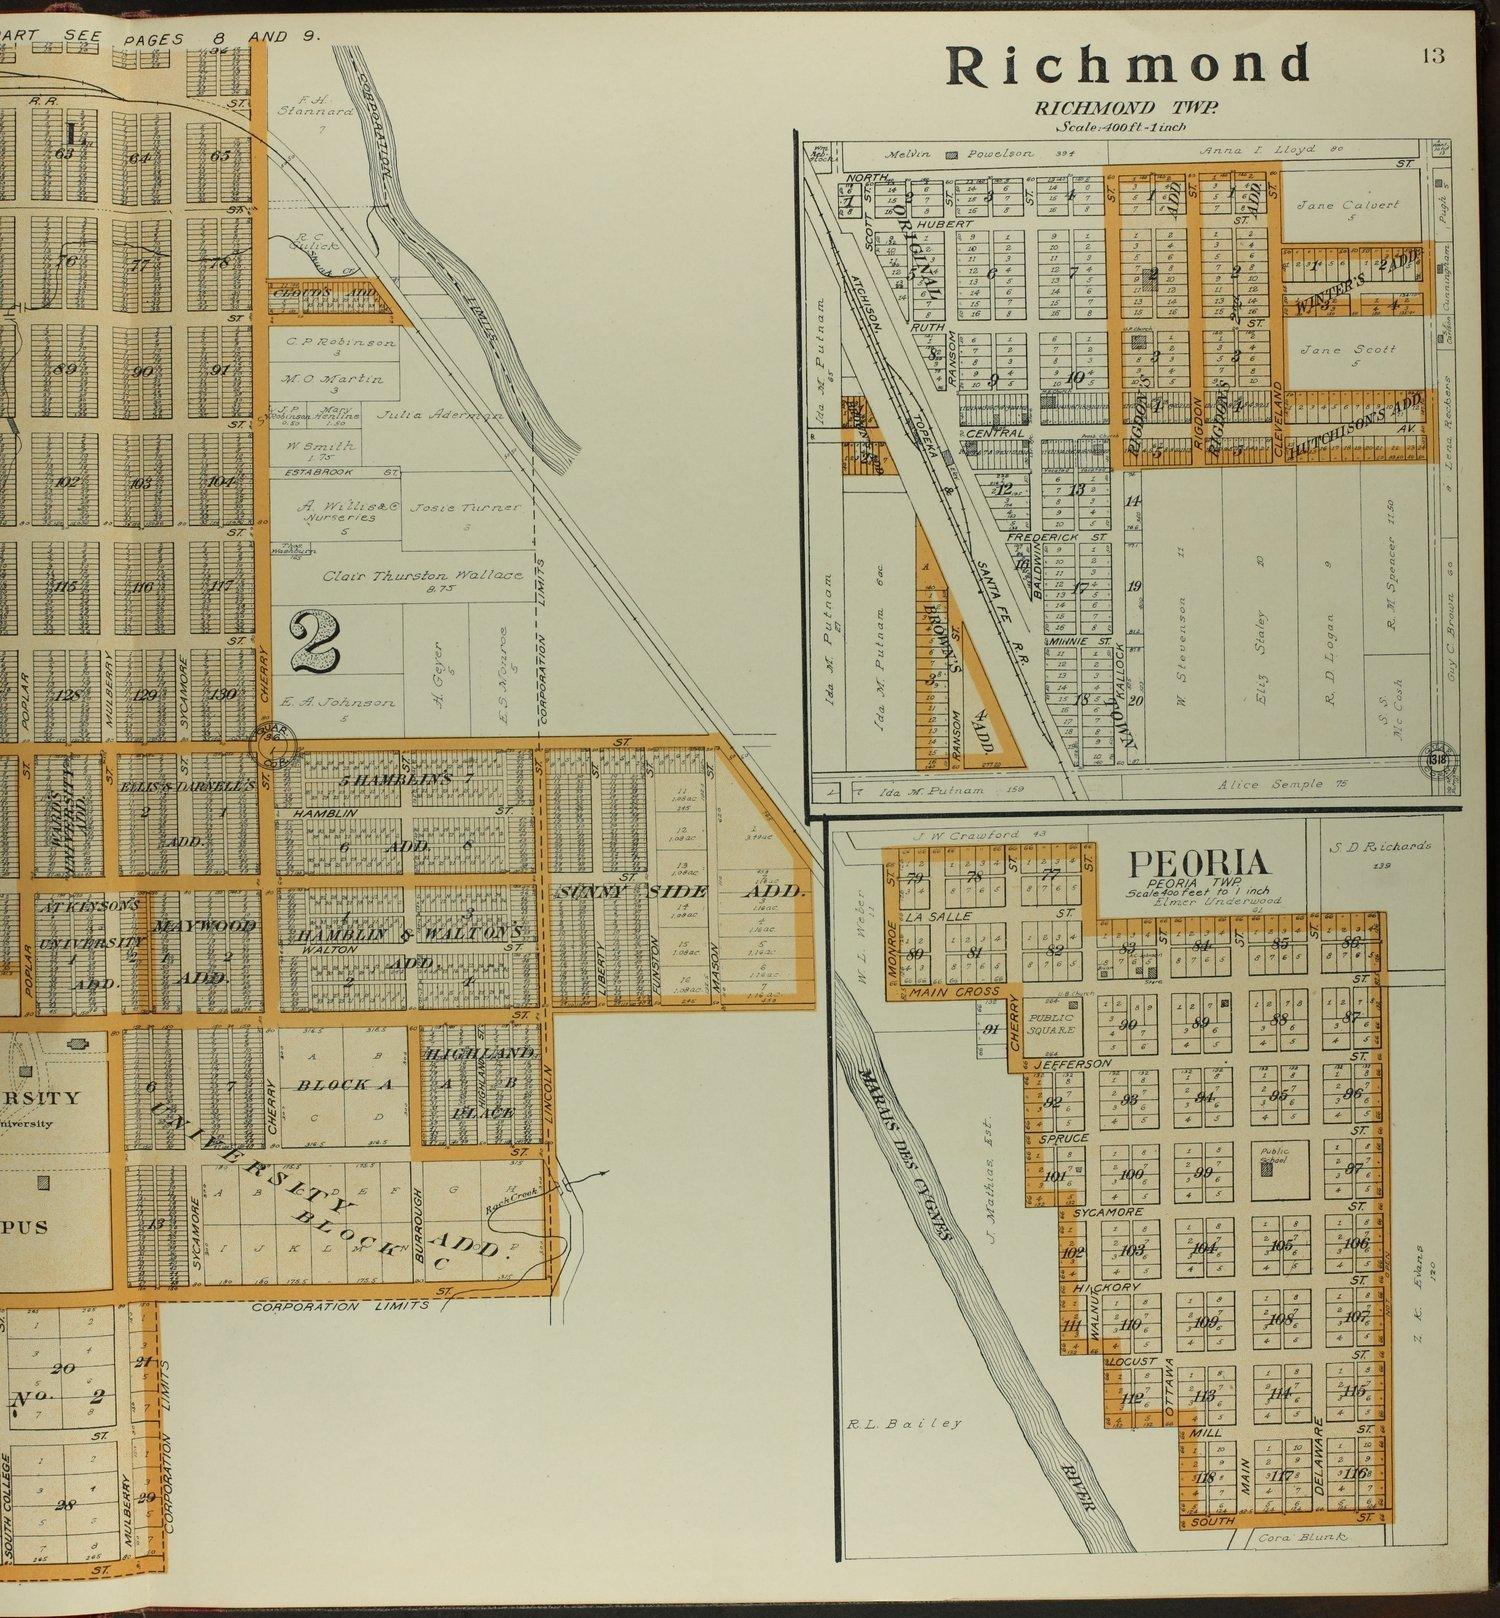 Standard atlas of Franklin County, Kansas - 13